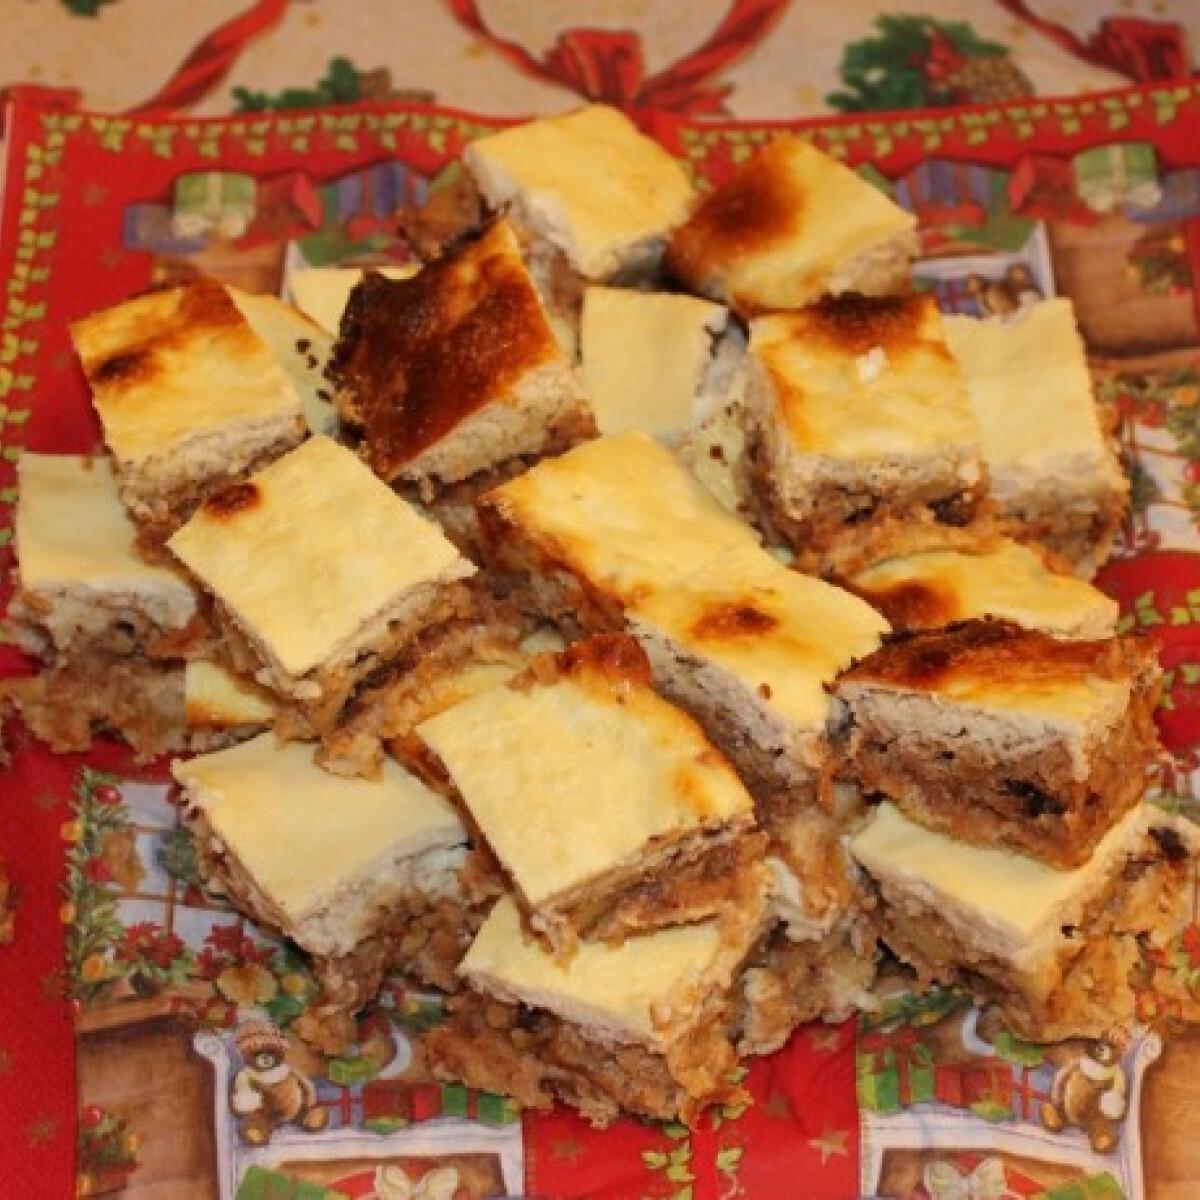 Mandulalisztes almás pite